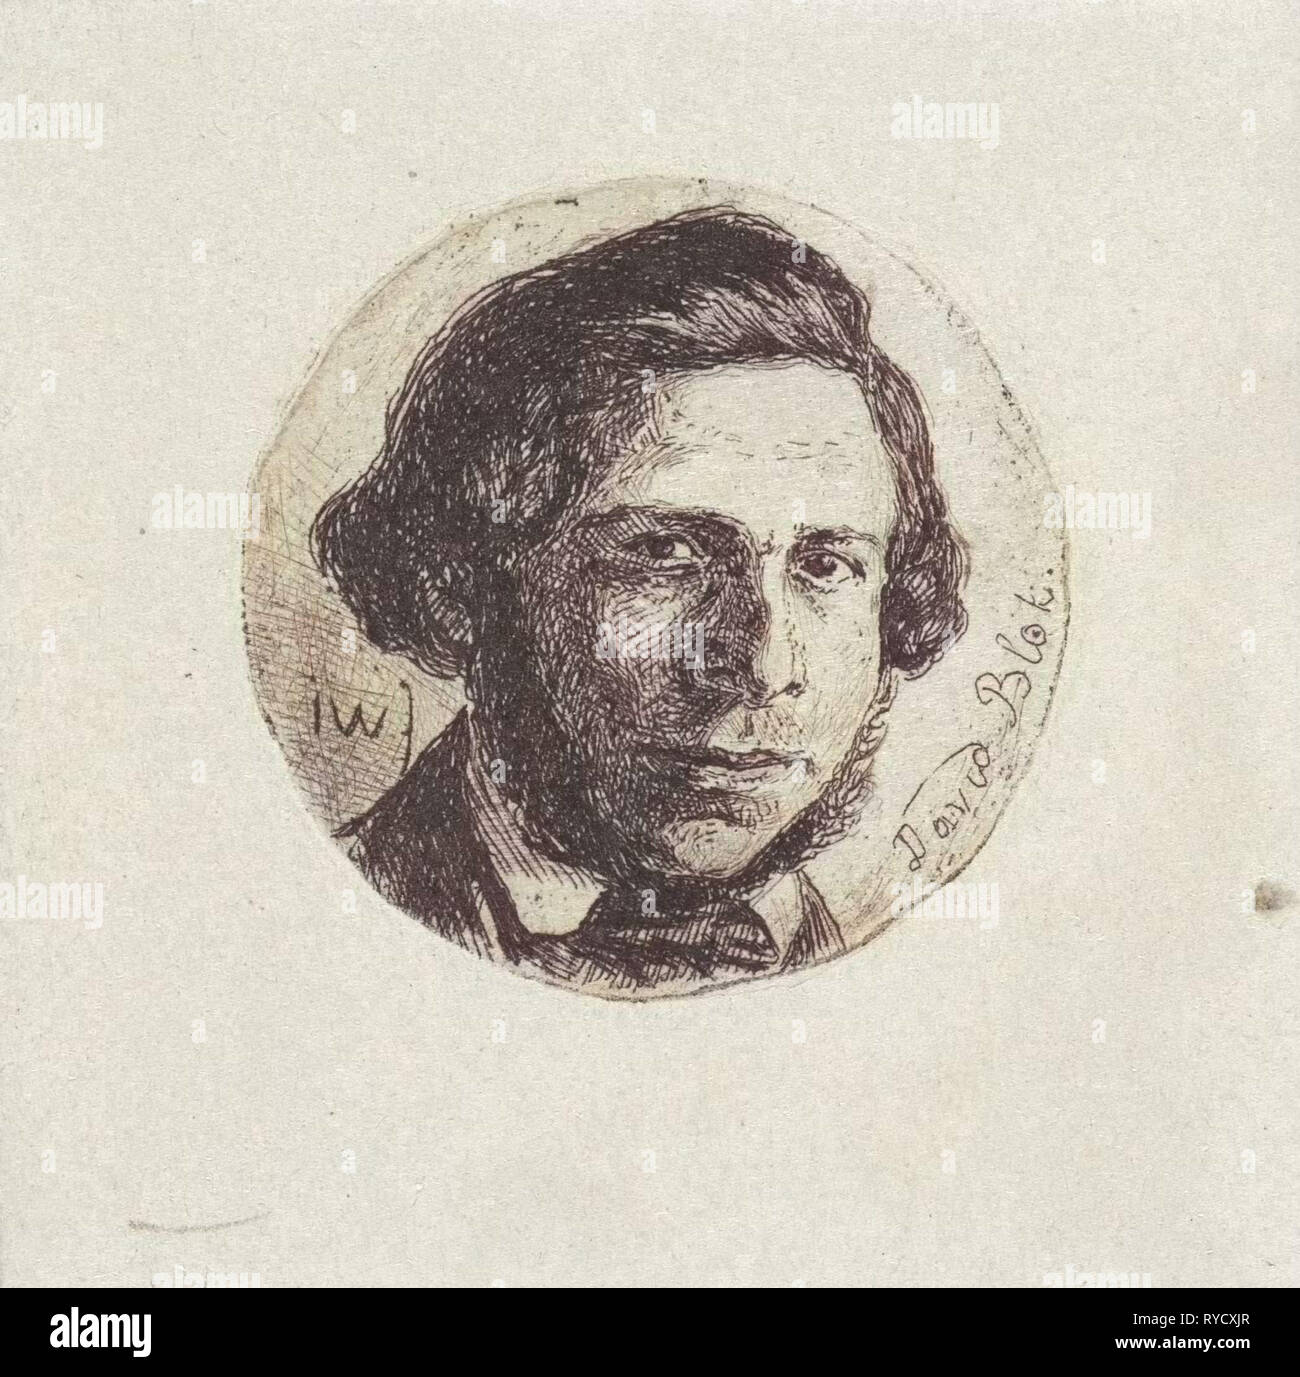 Portrait of David Block, Jan Weissenbruch, 1837 - 1880 - Stock Image